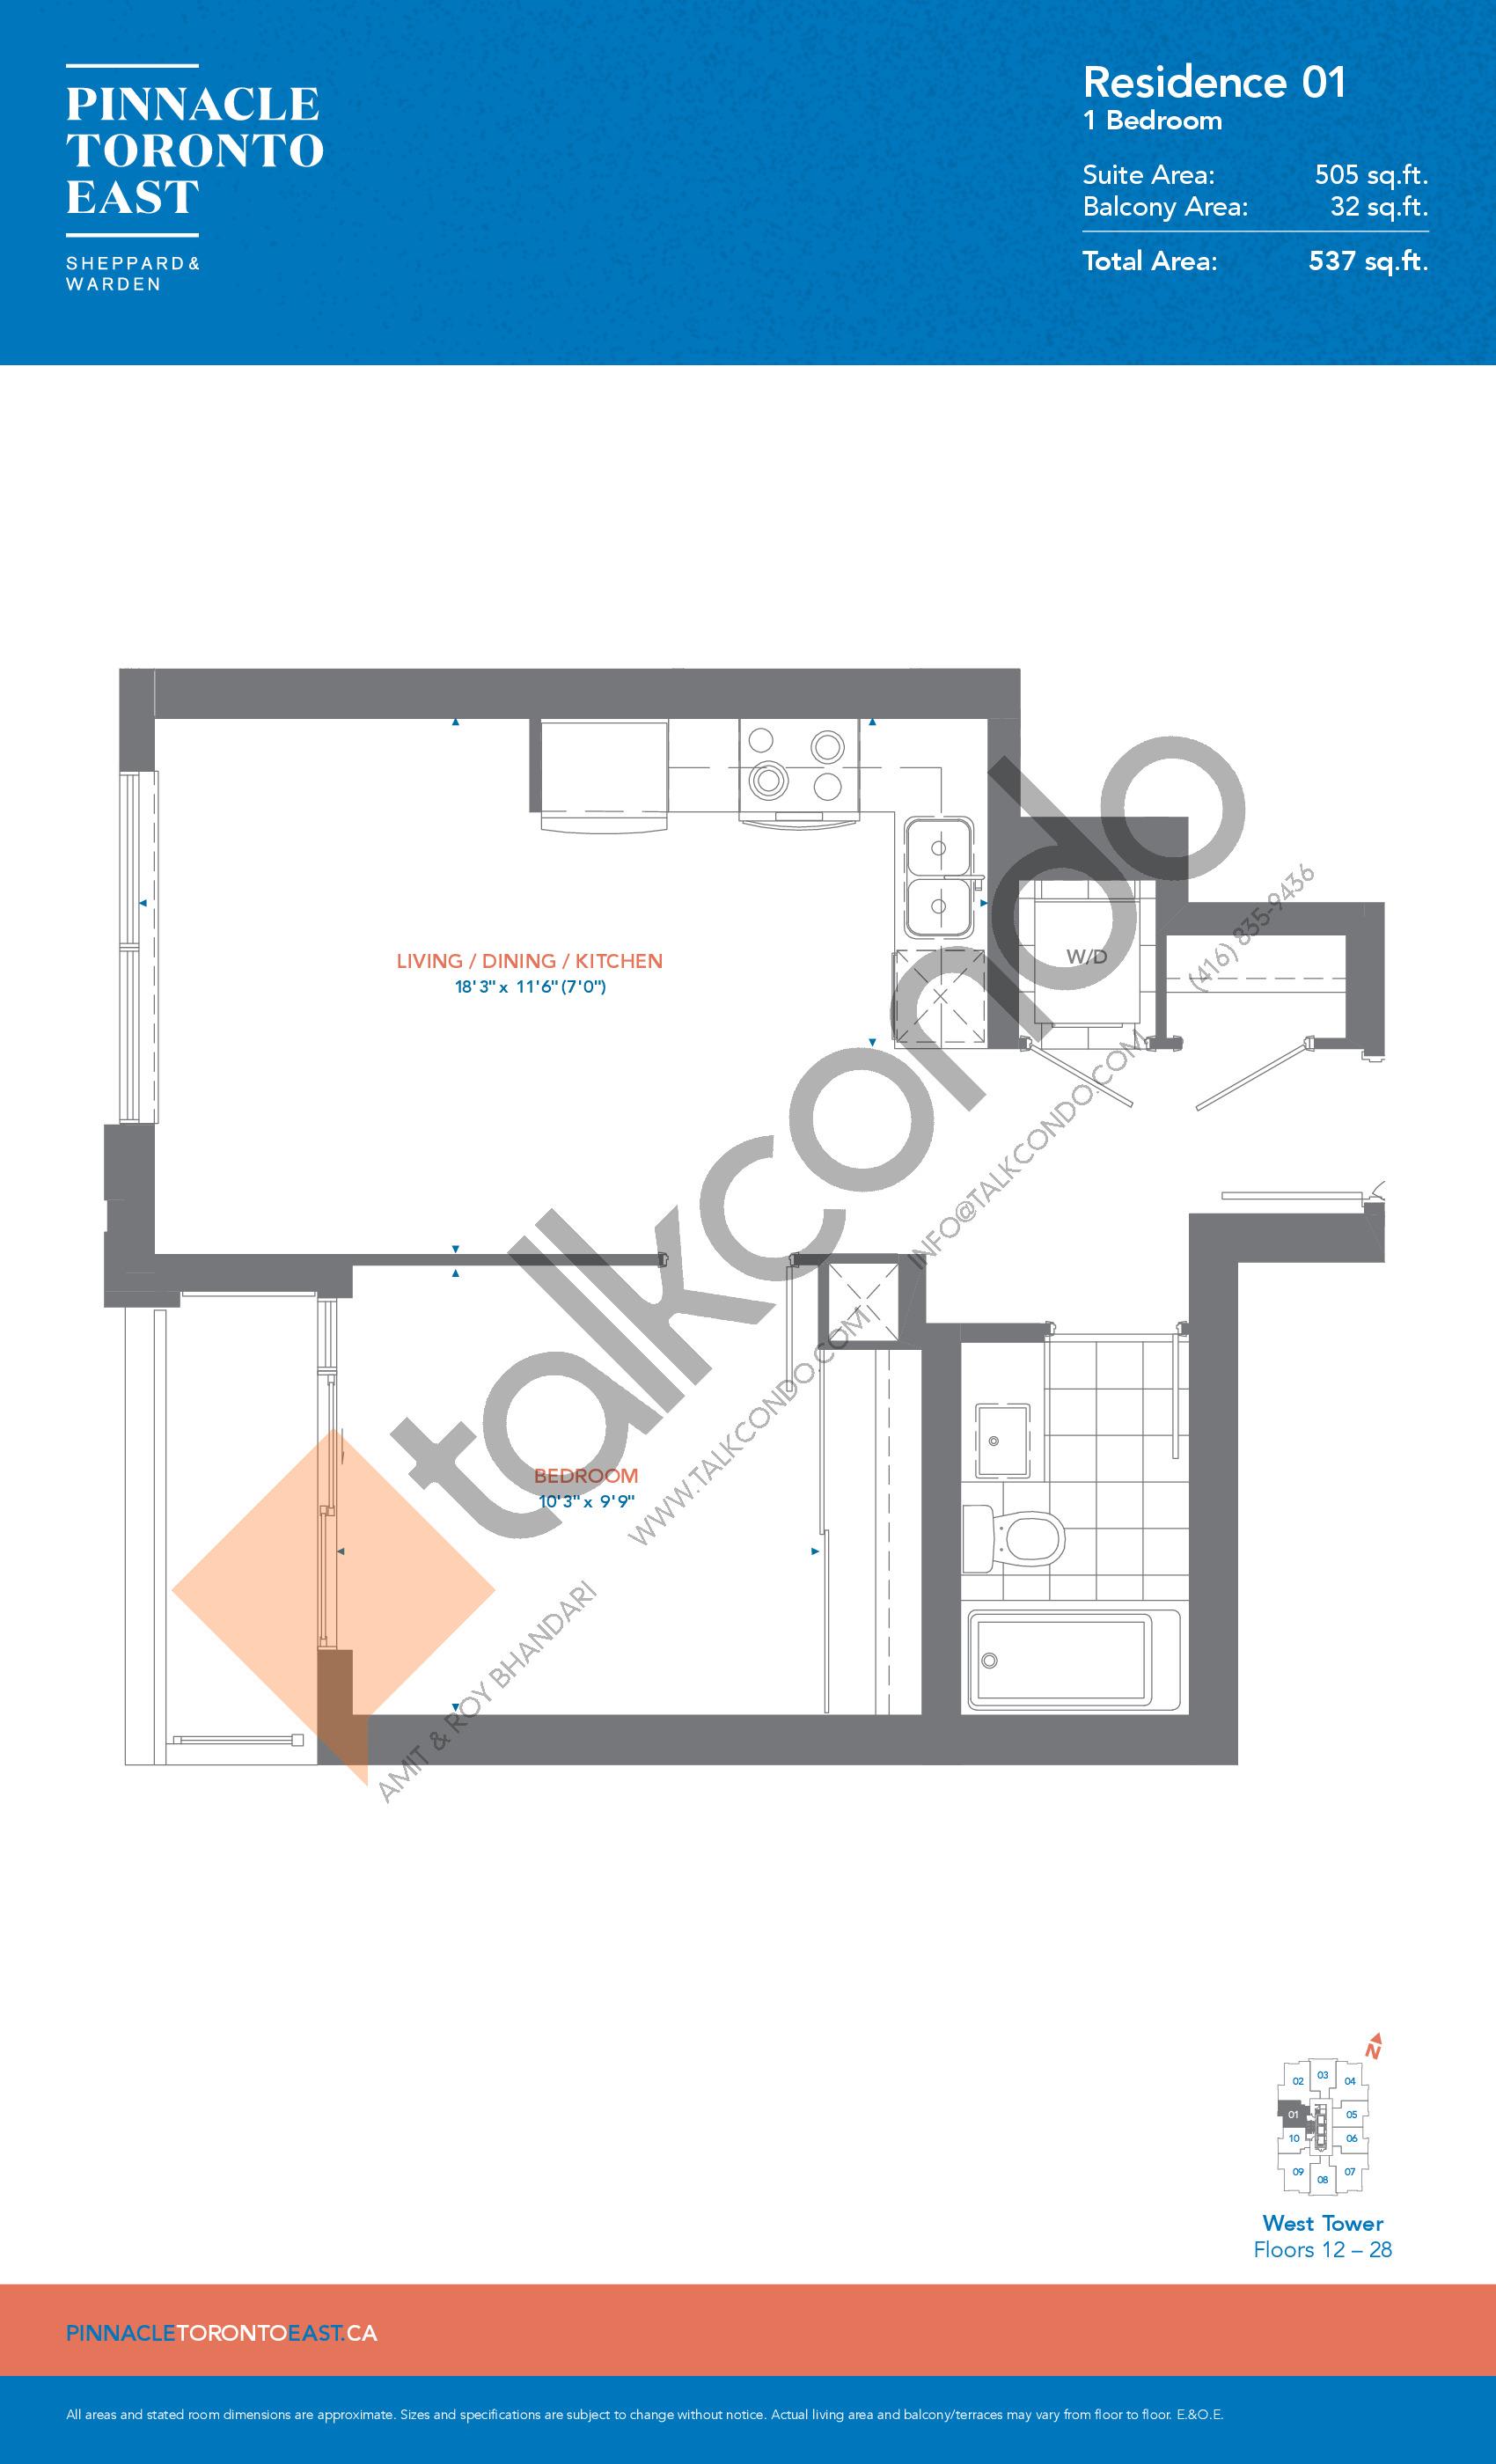 Residence 01 - West Tower Floor Plan at Pinnacle Toronto East Condos - 505 sq.ft